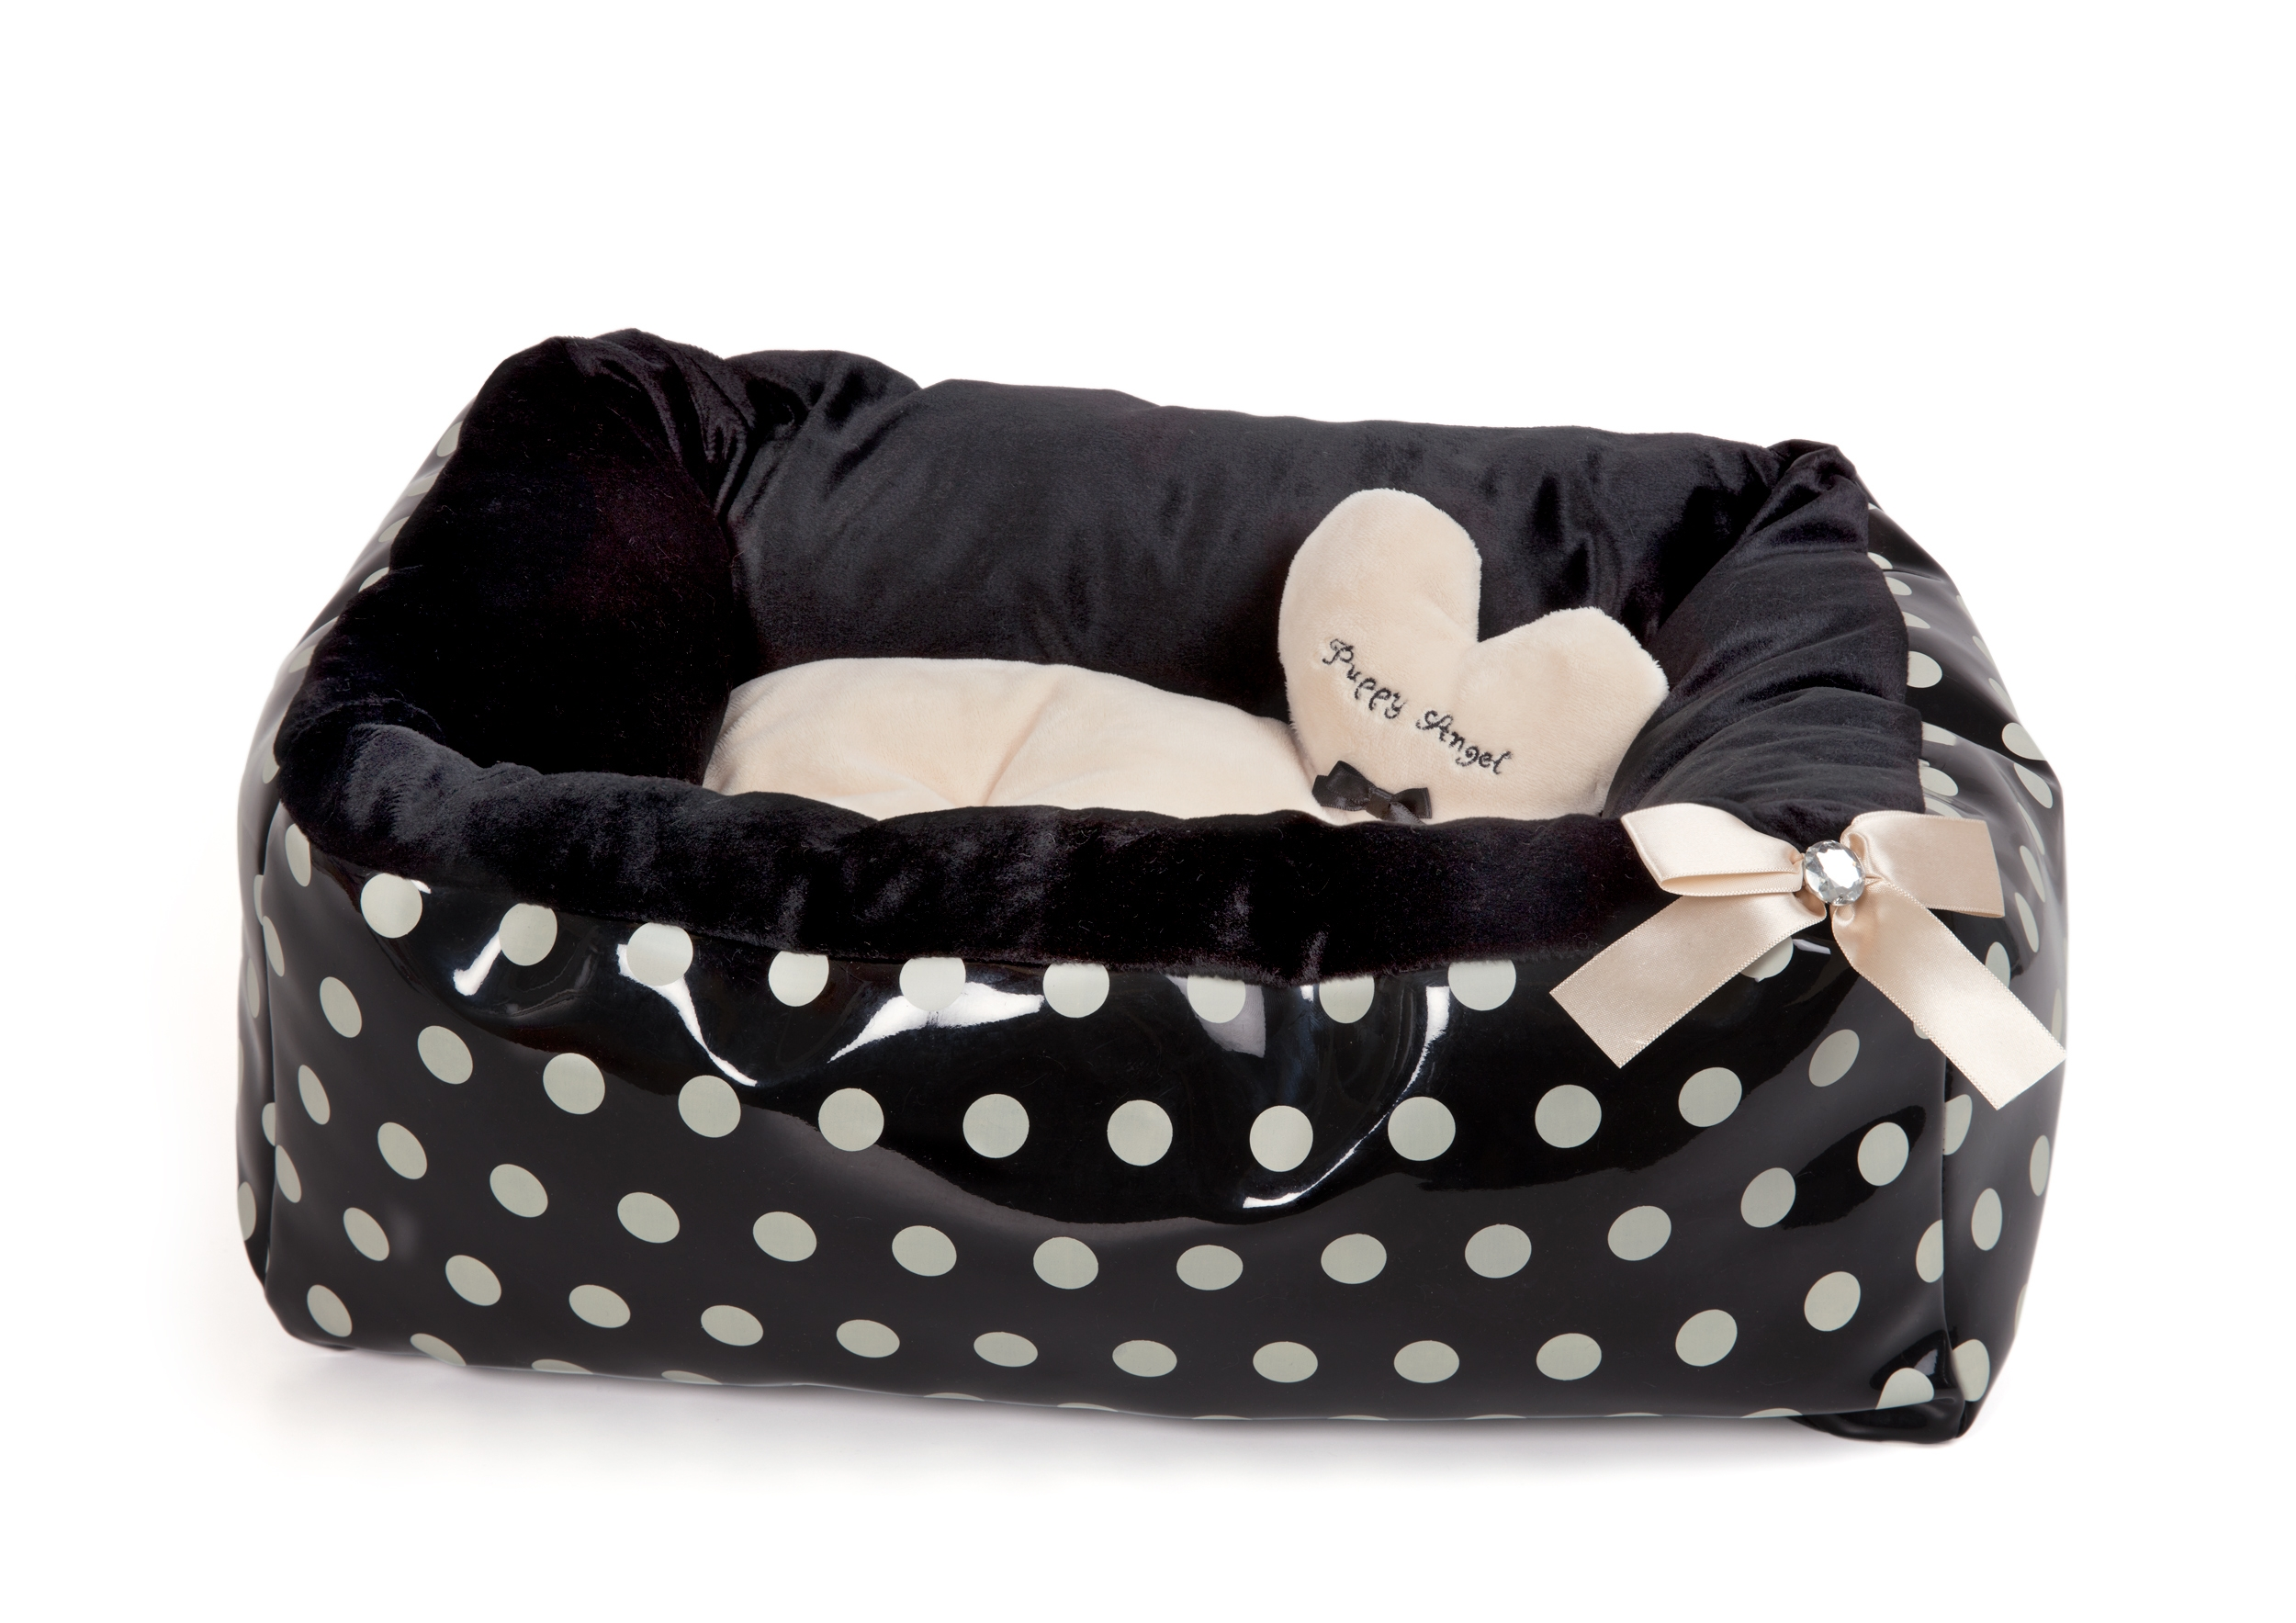 Polkadot Ease Bed - Beige